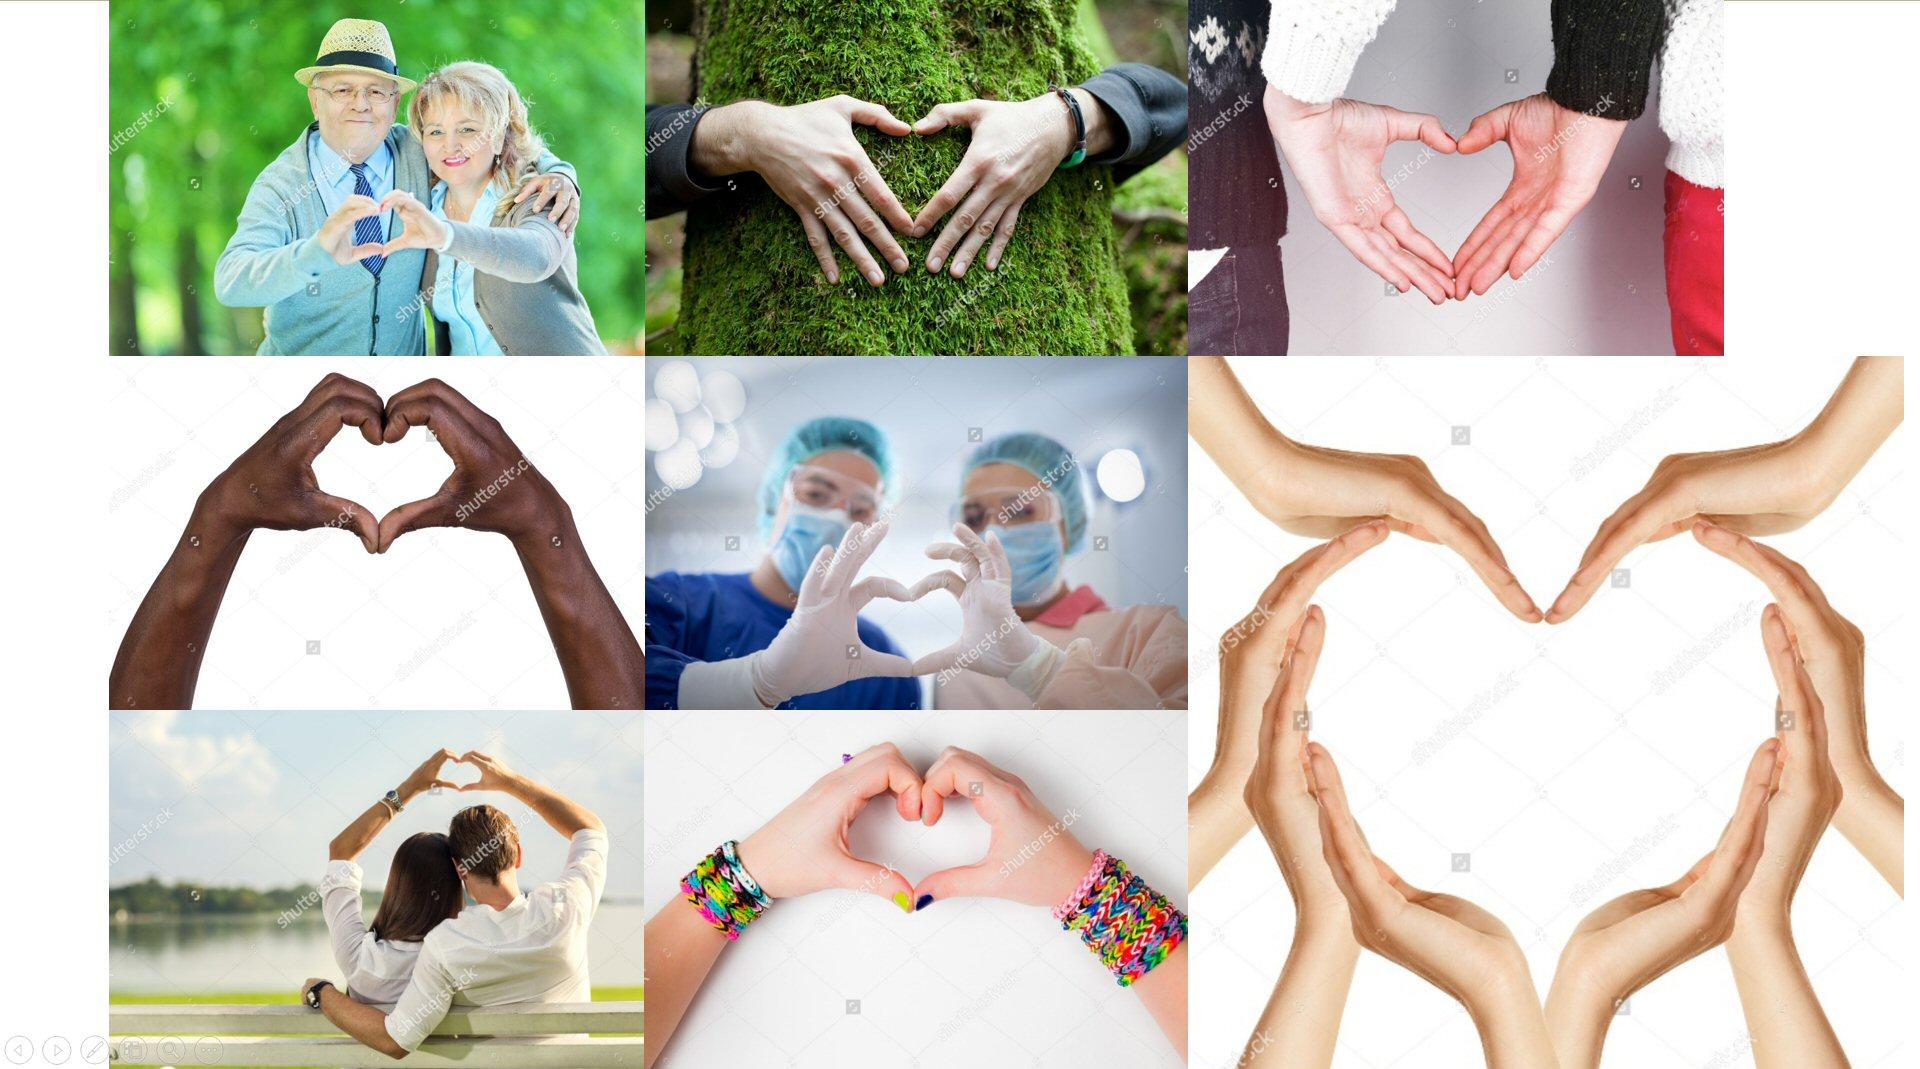 Touch is love - hands heart - Alberto Pozzi